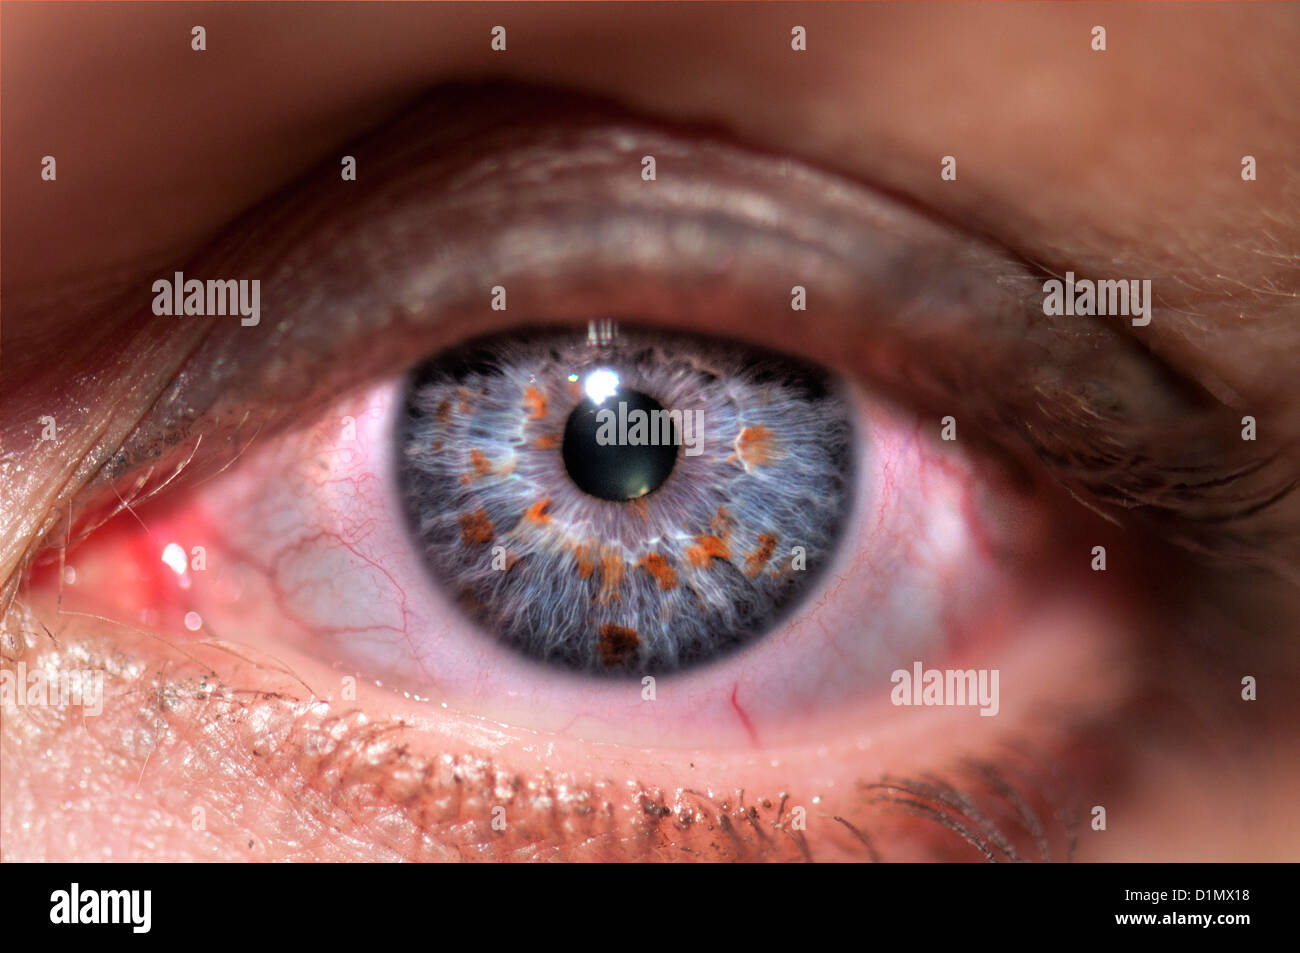 Extreme closeup of a human eye grey  - Stock Image